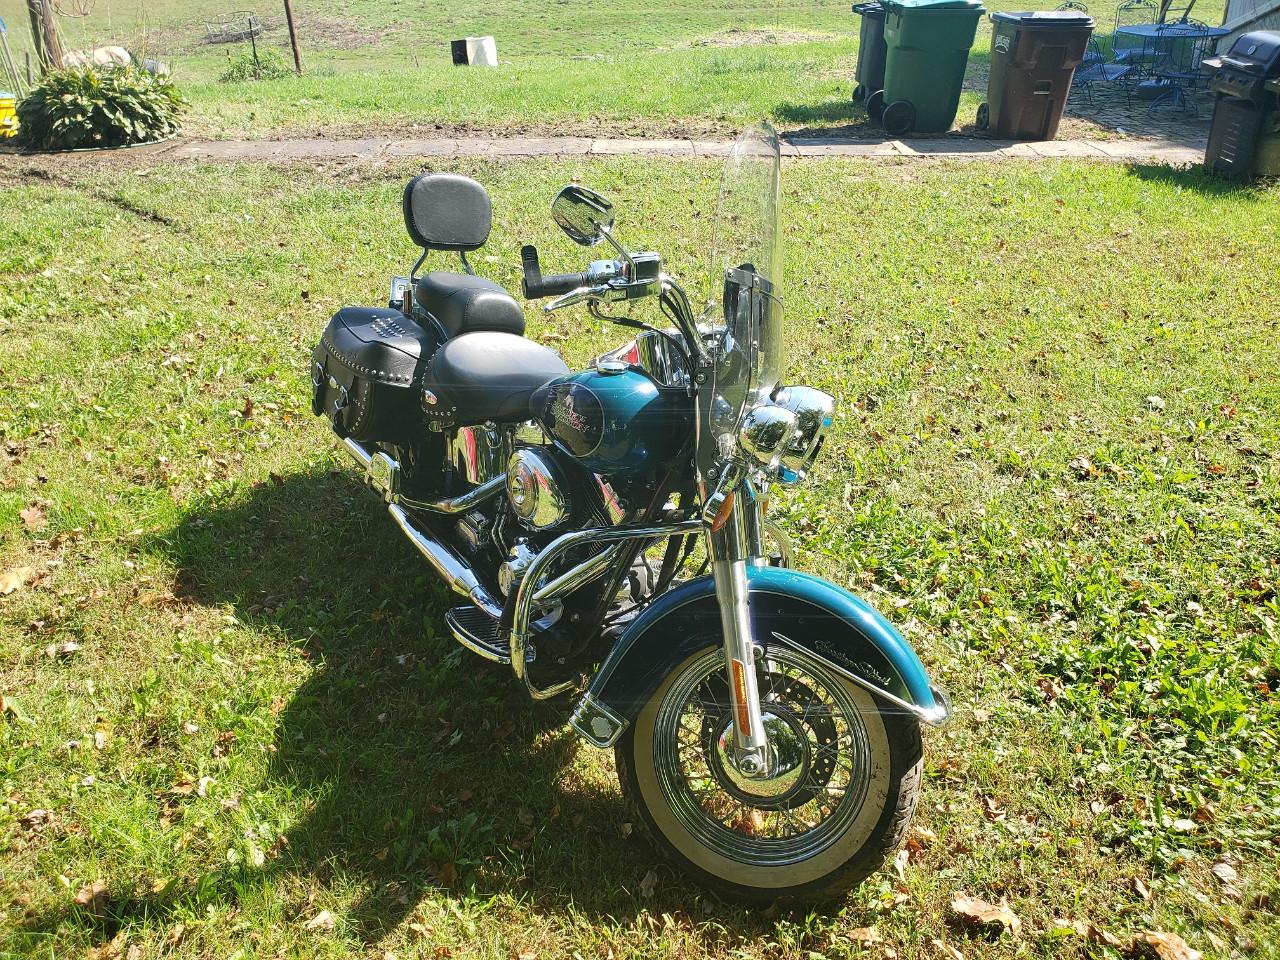 Craigslist Lima Findlay Ohio Motorcycles | Reviewmotors.co